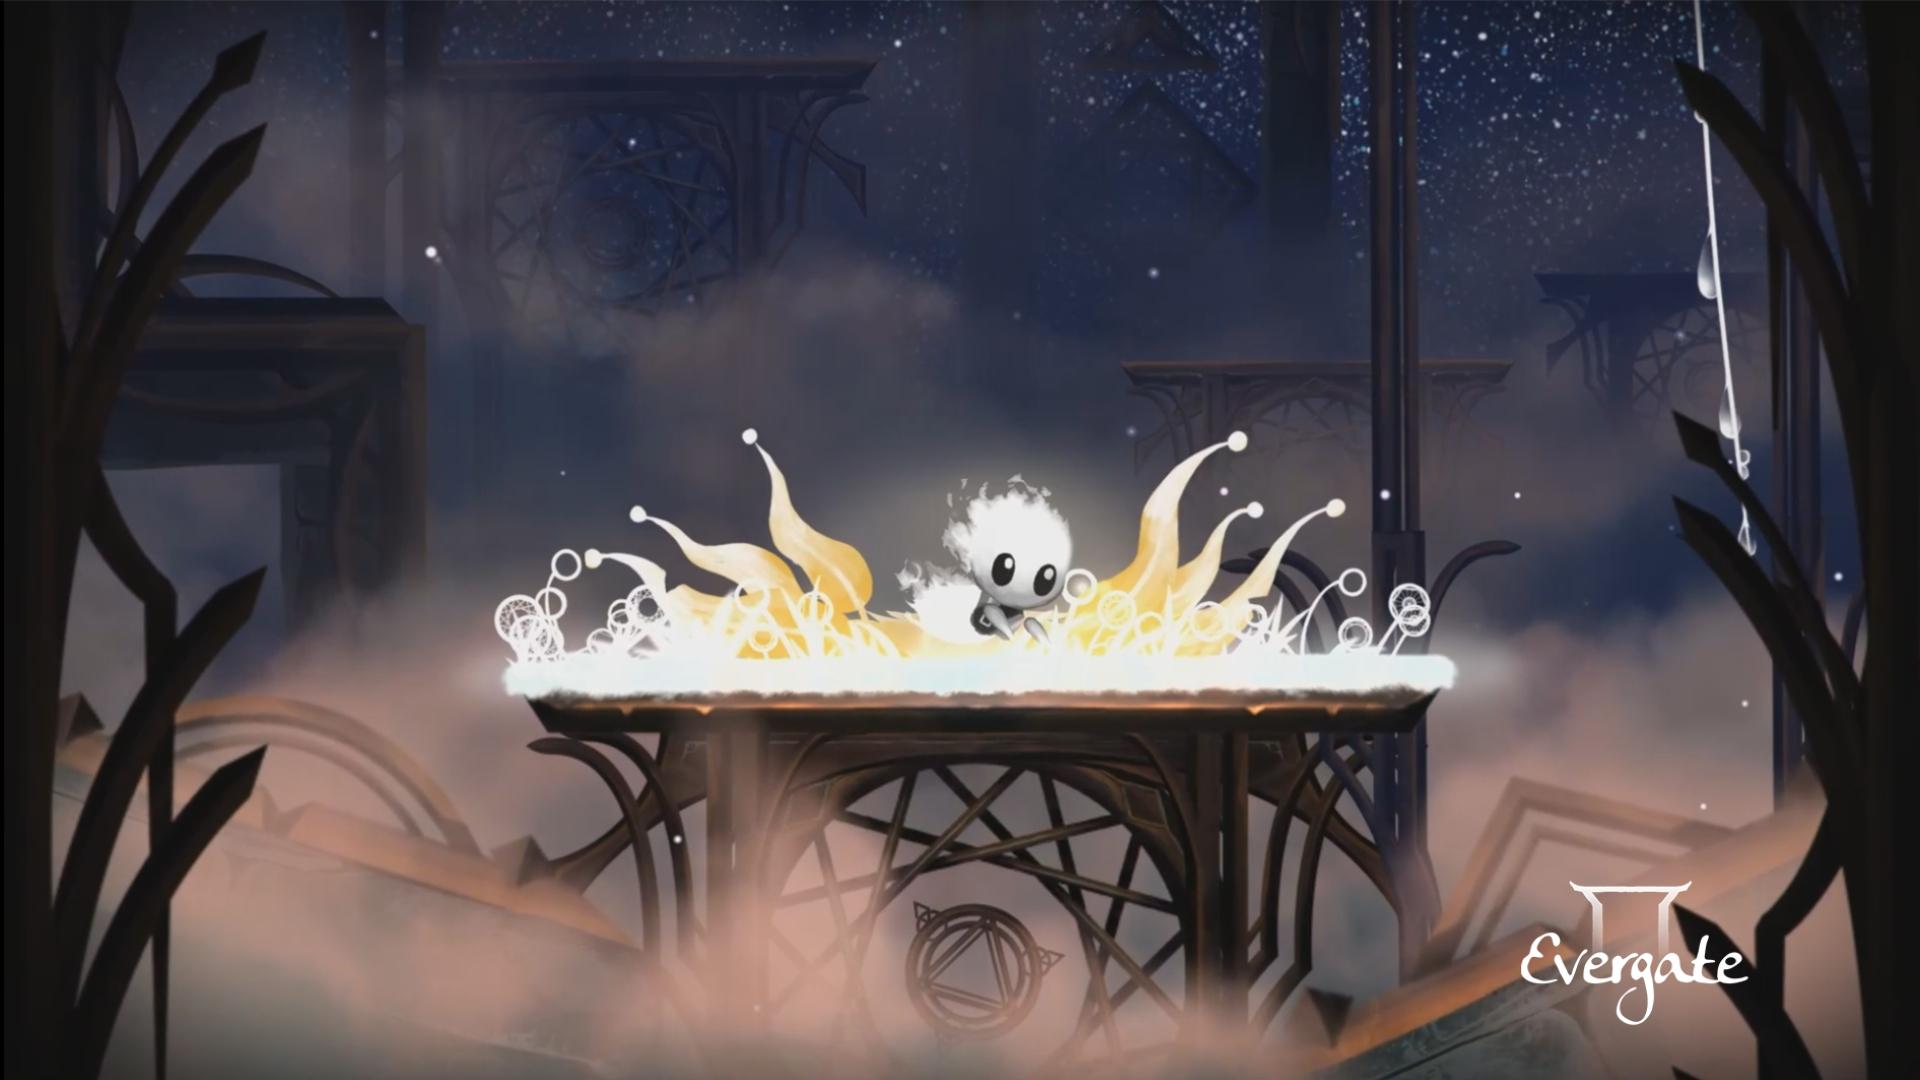 Stone Lantern Games launches Evergate Kickstarter